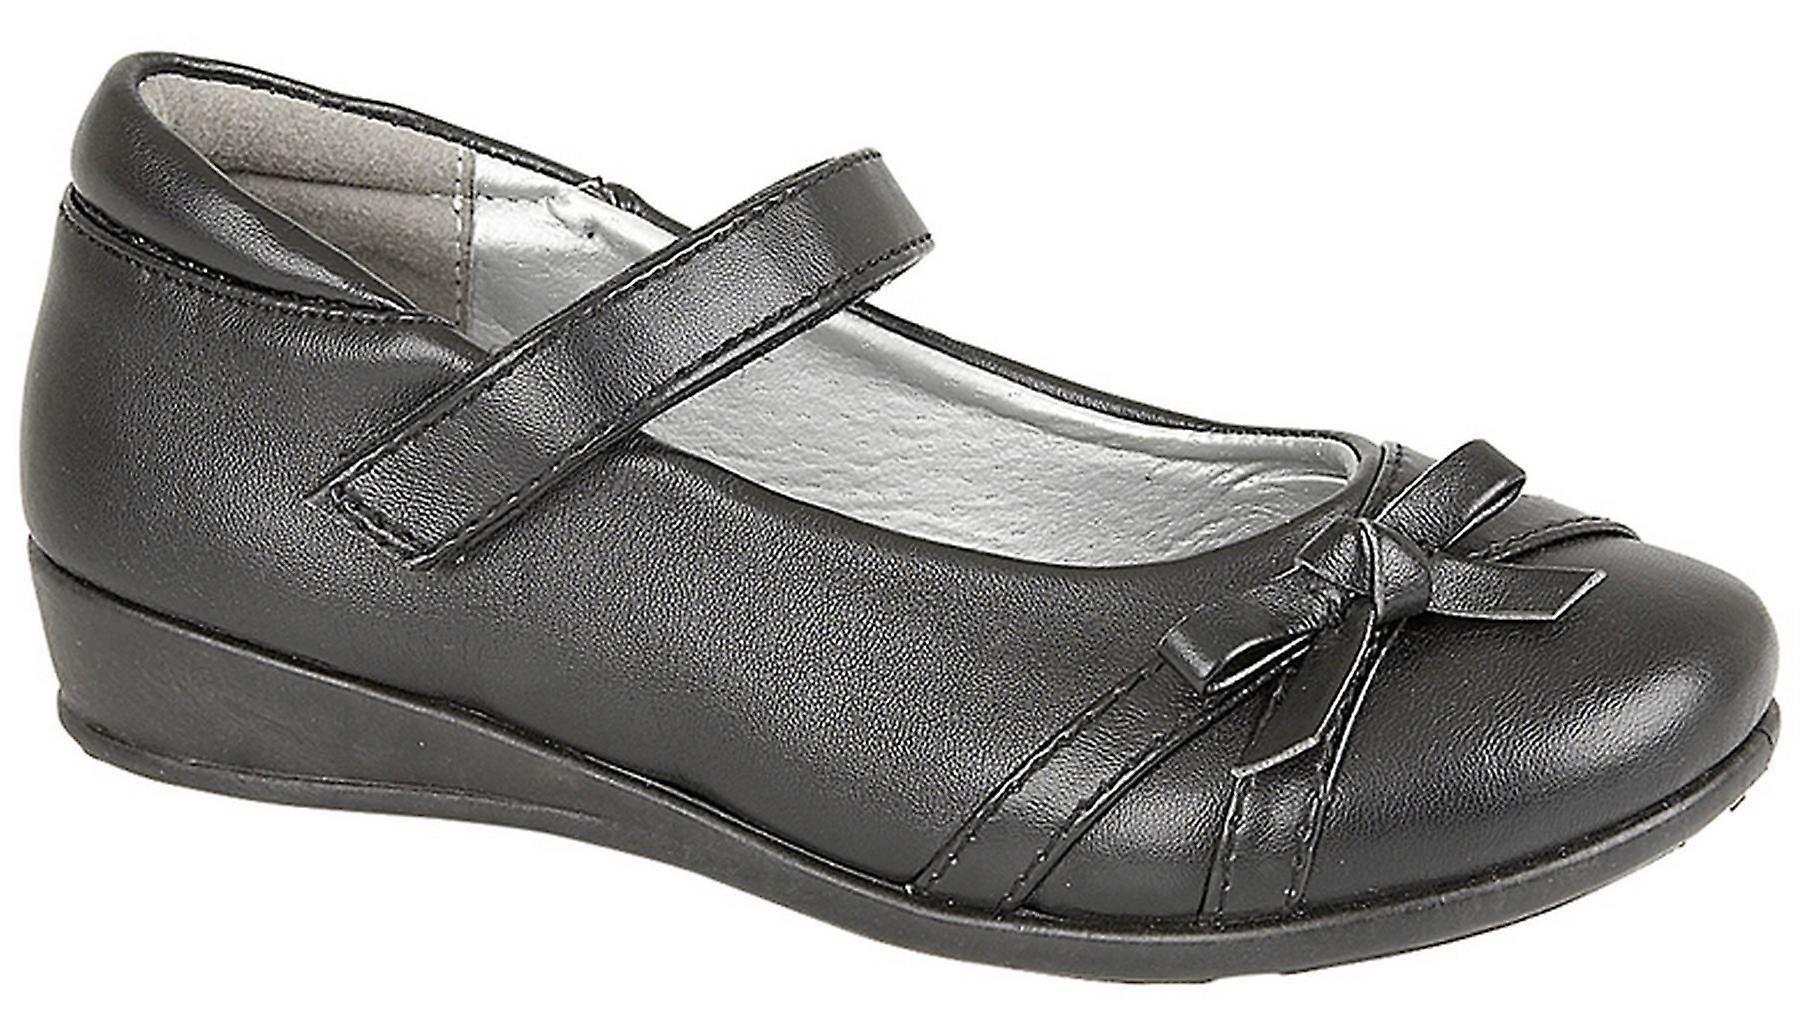 Infant Girls Touch Fastening Formal Bow Trim School Return Bar Formal Fastening Shoes 97f805